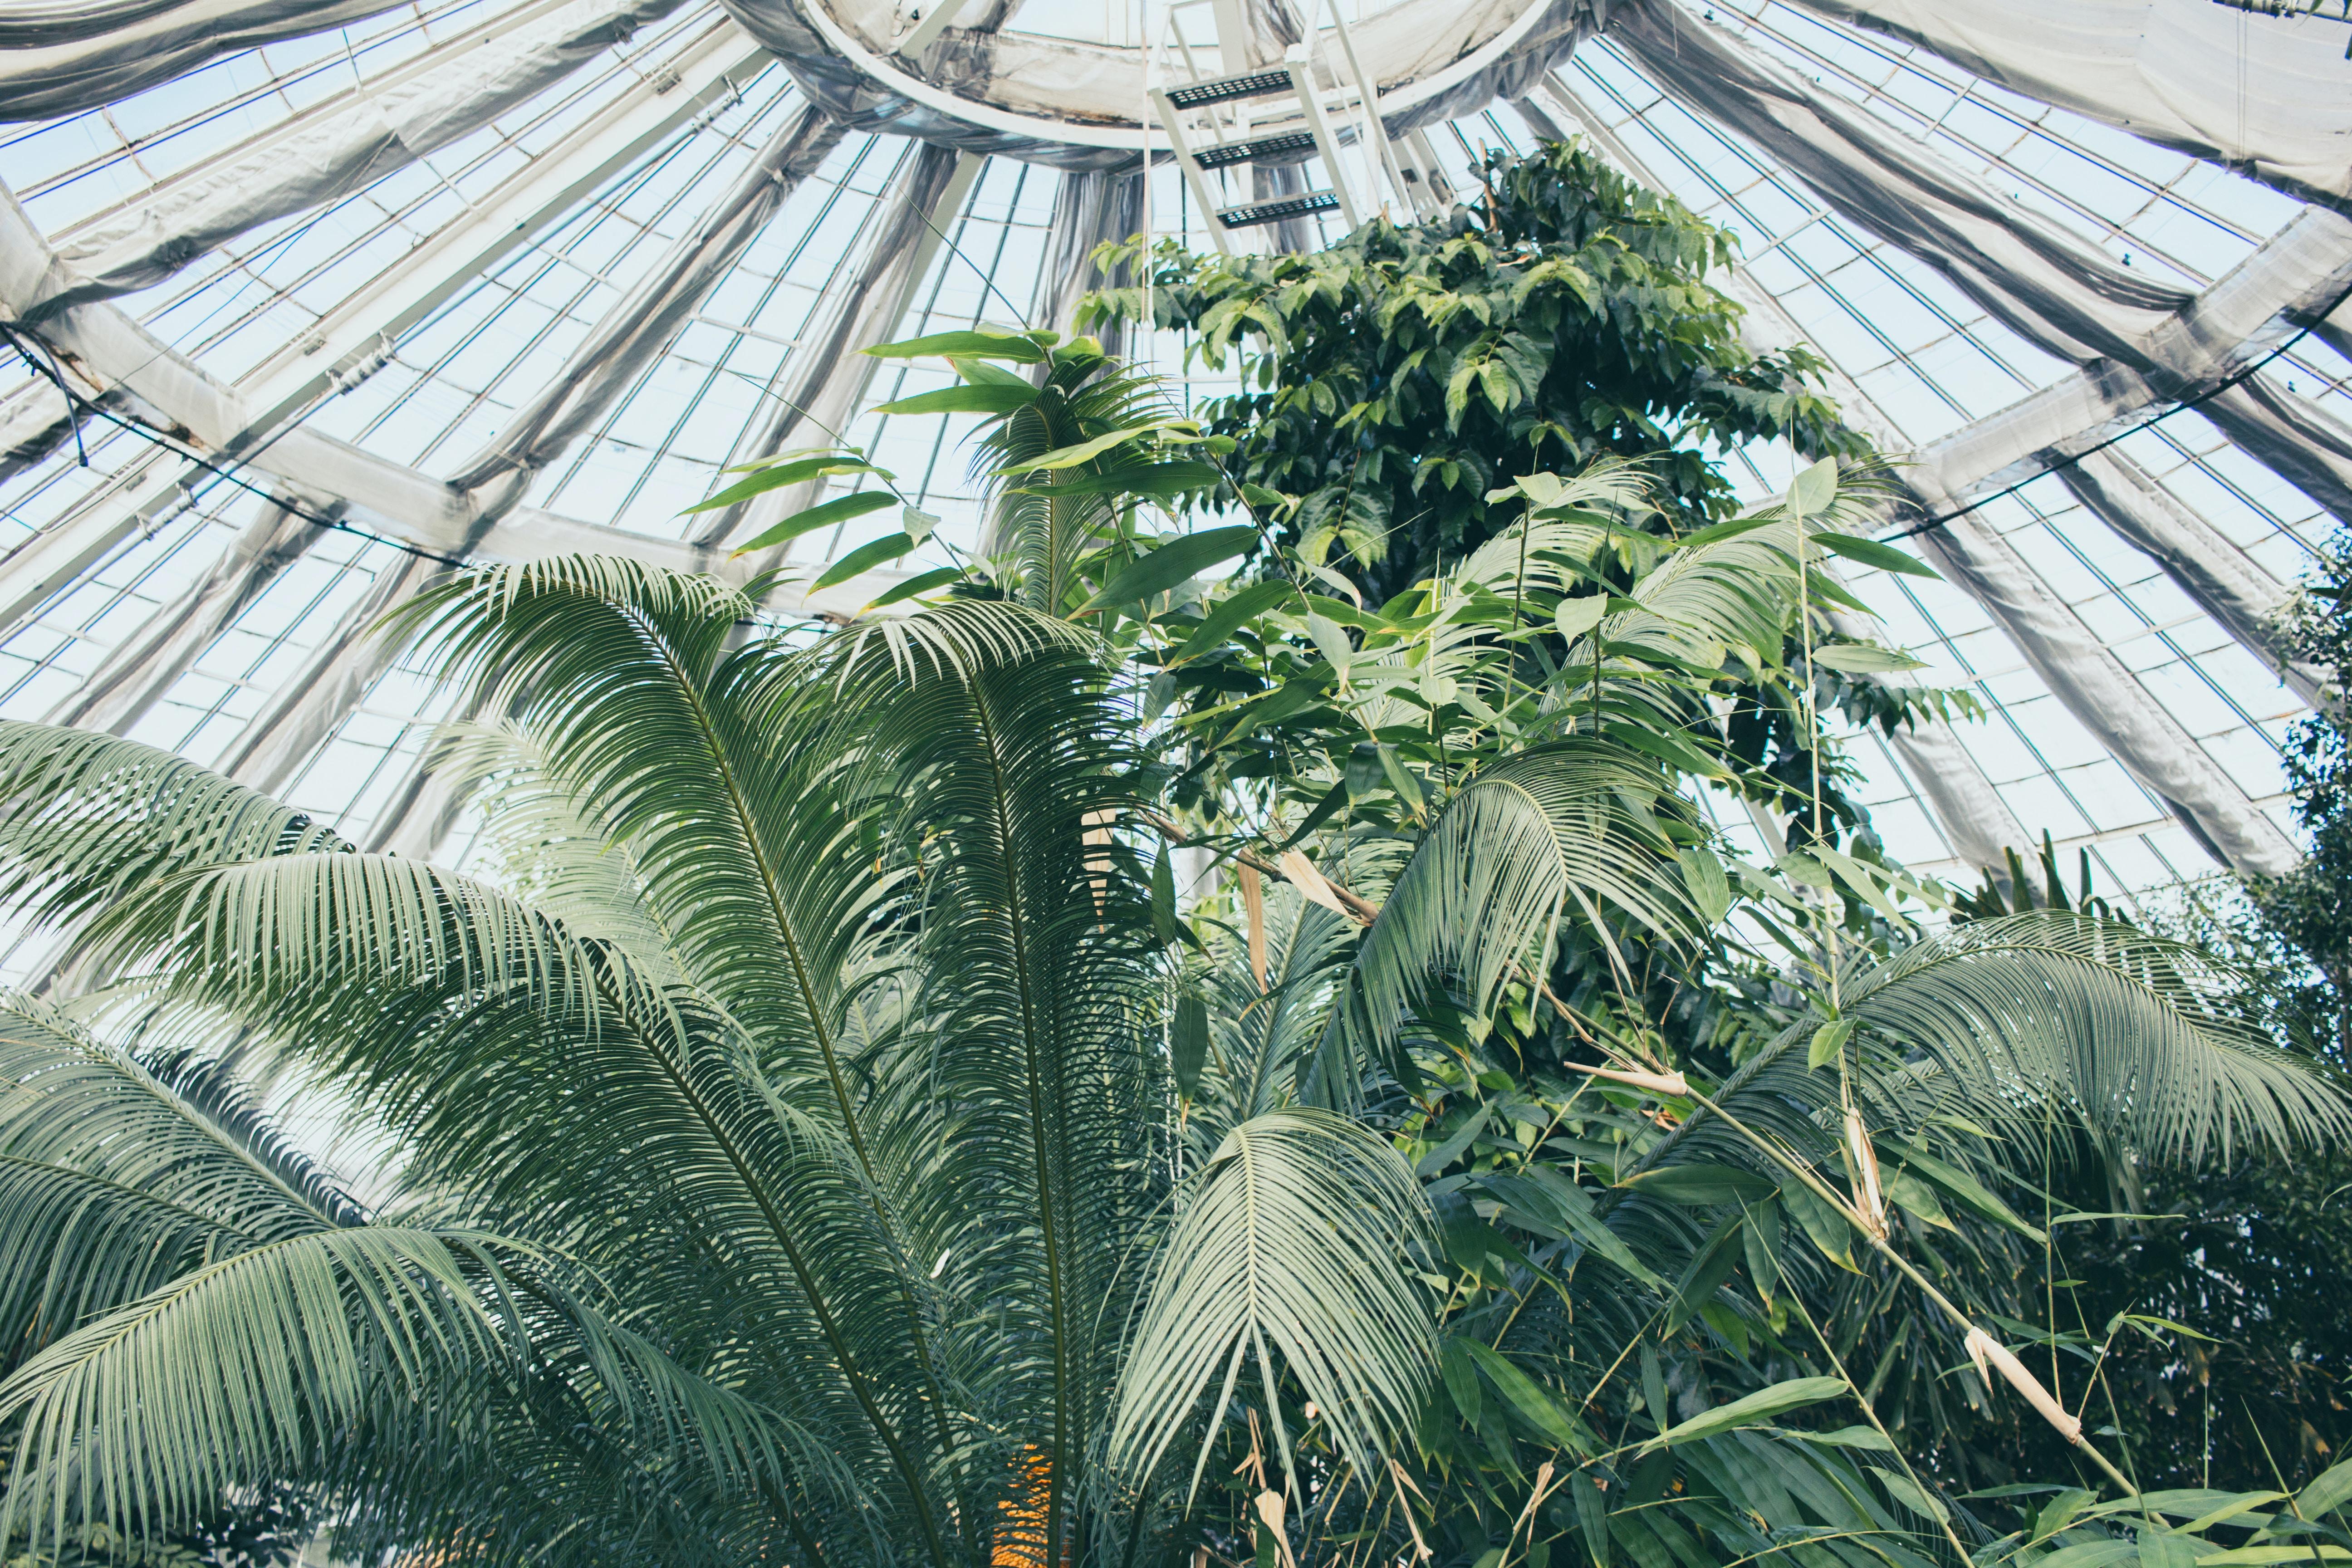 low-angle photo of palm tree